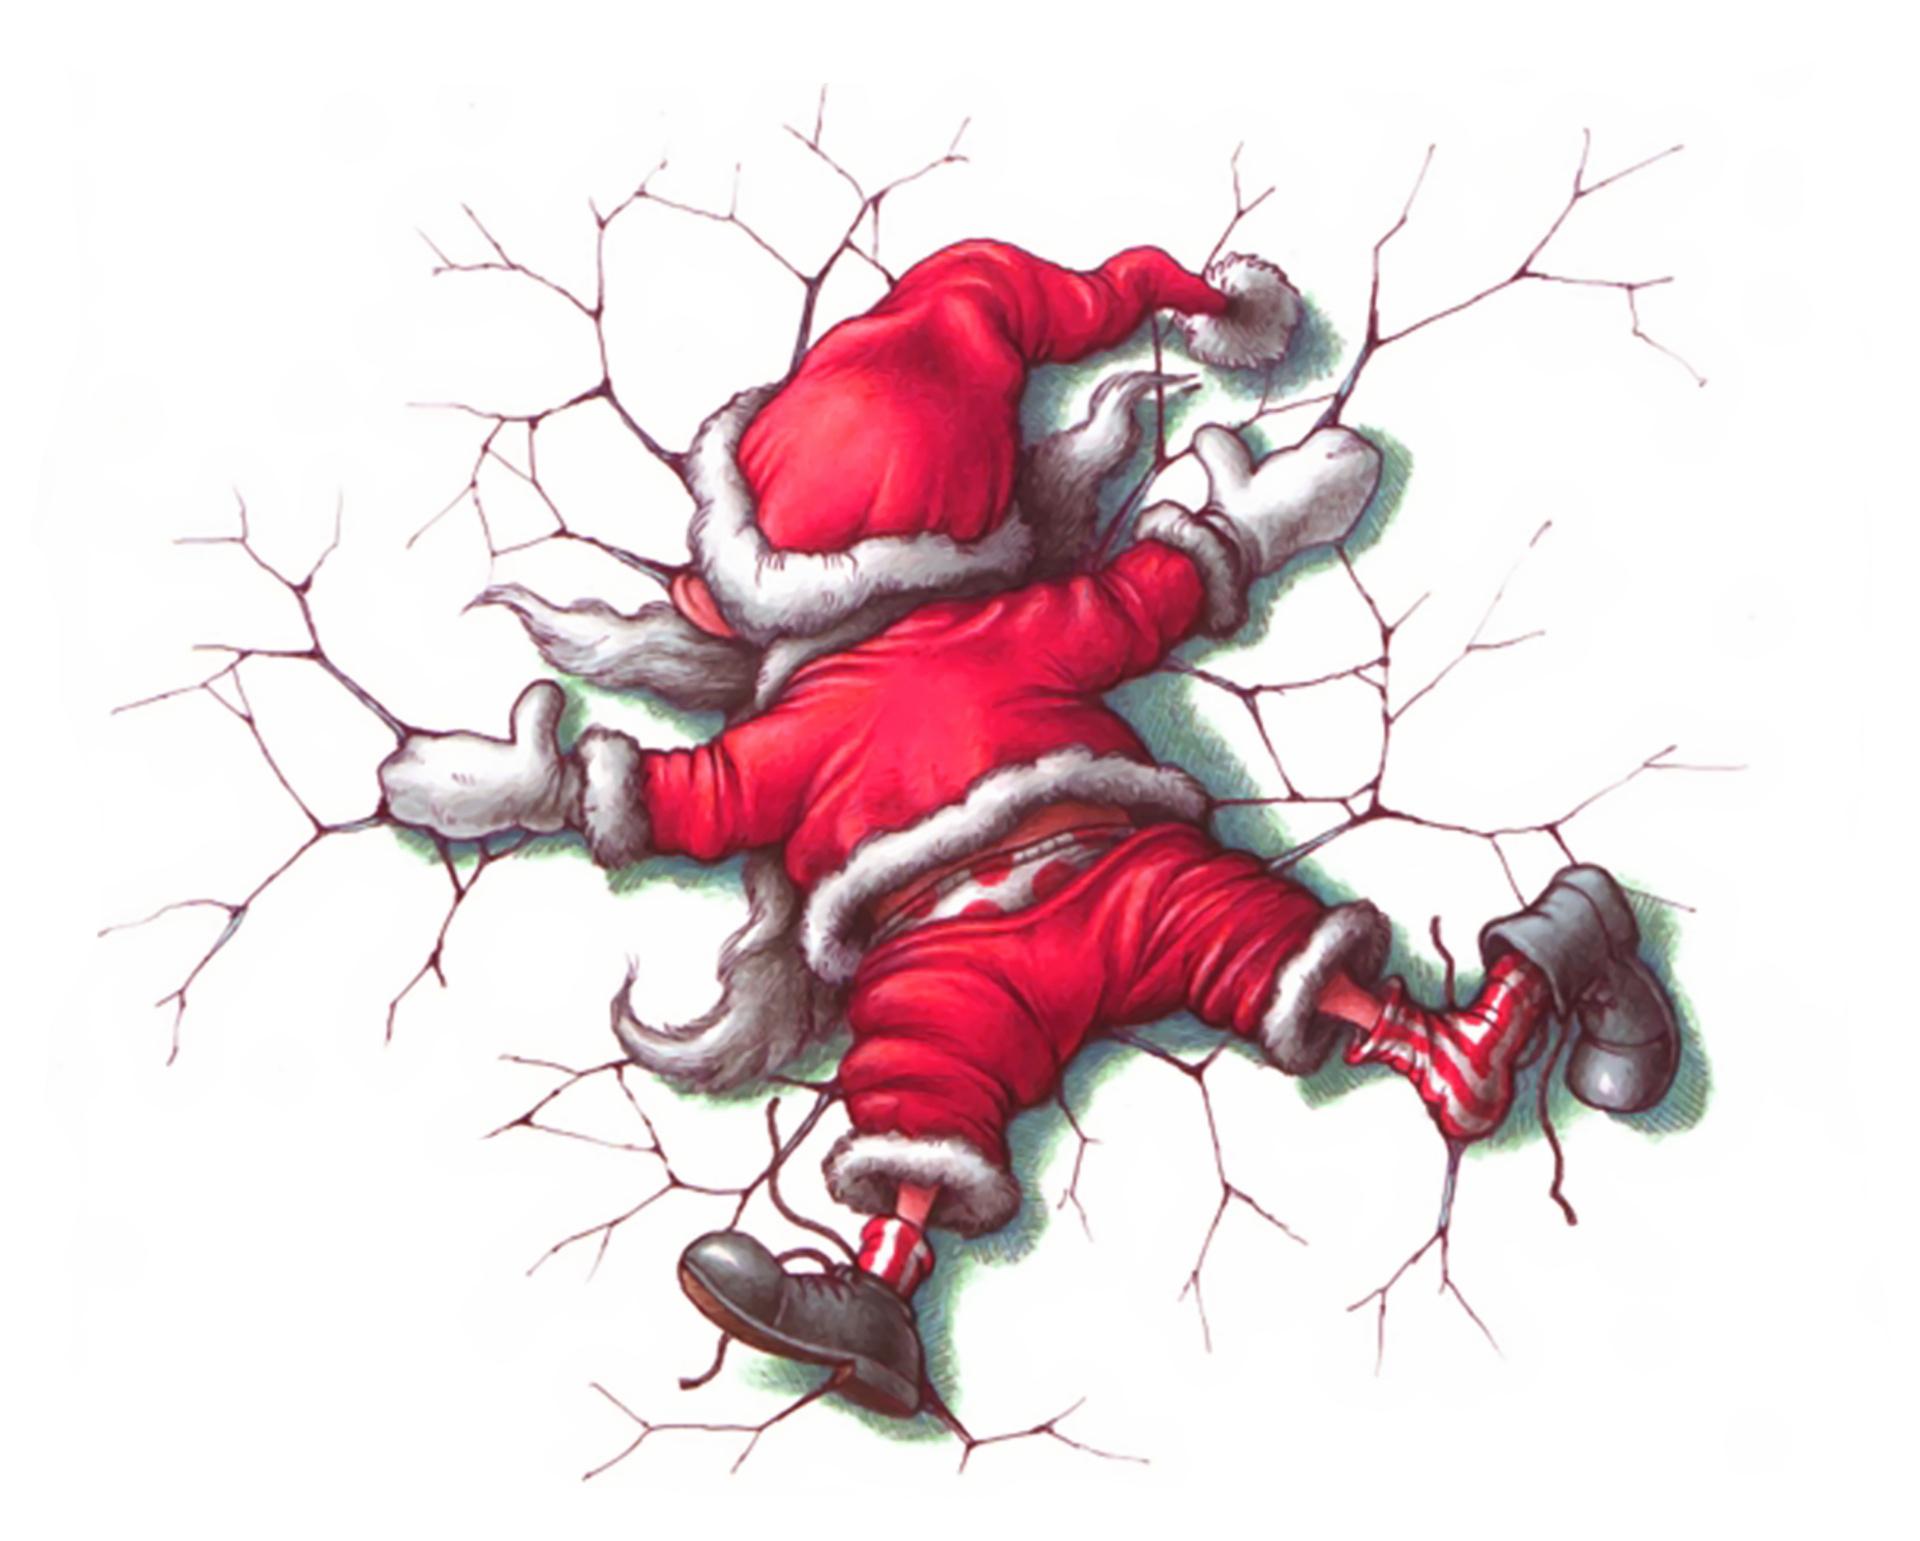 Funny Christmas Wallpaper 19202151541 23248 HD Wallpaper 1920x1541